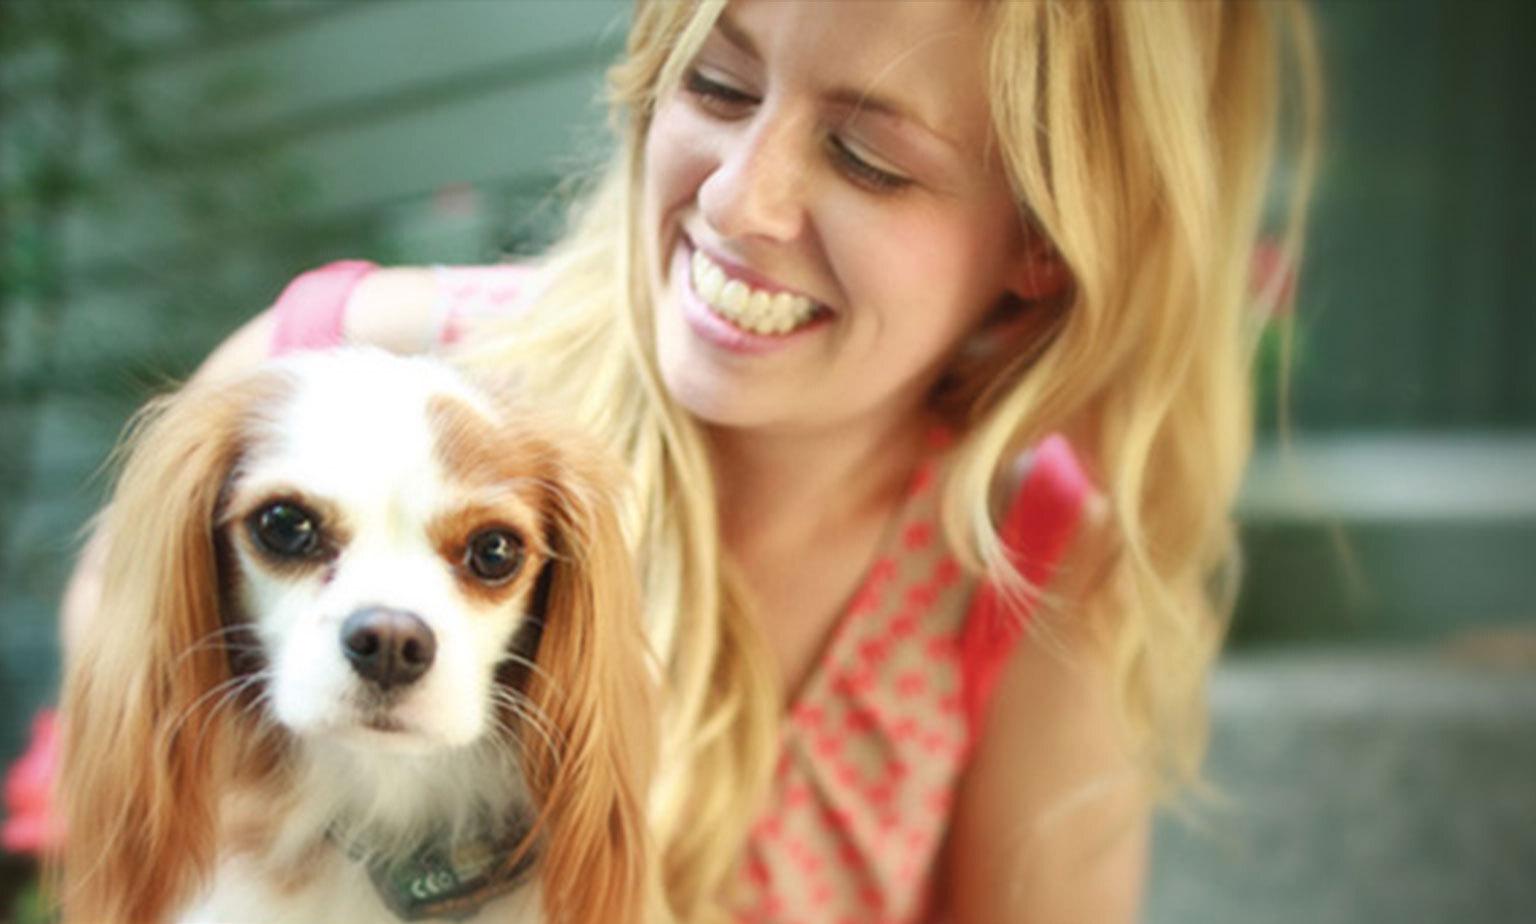 save up to 10% off PetSafe